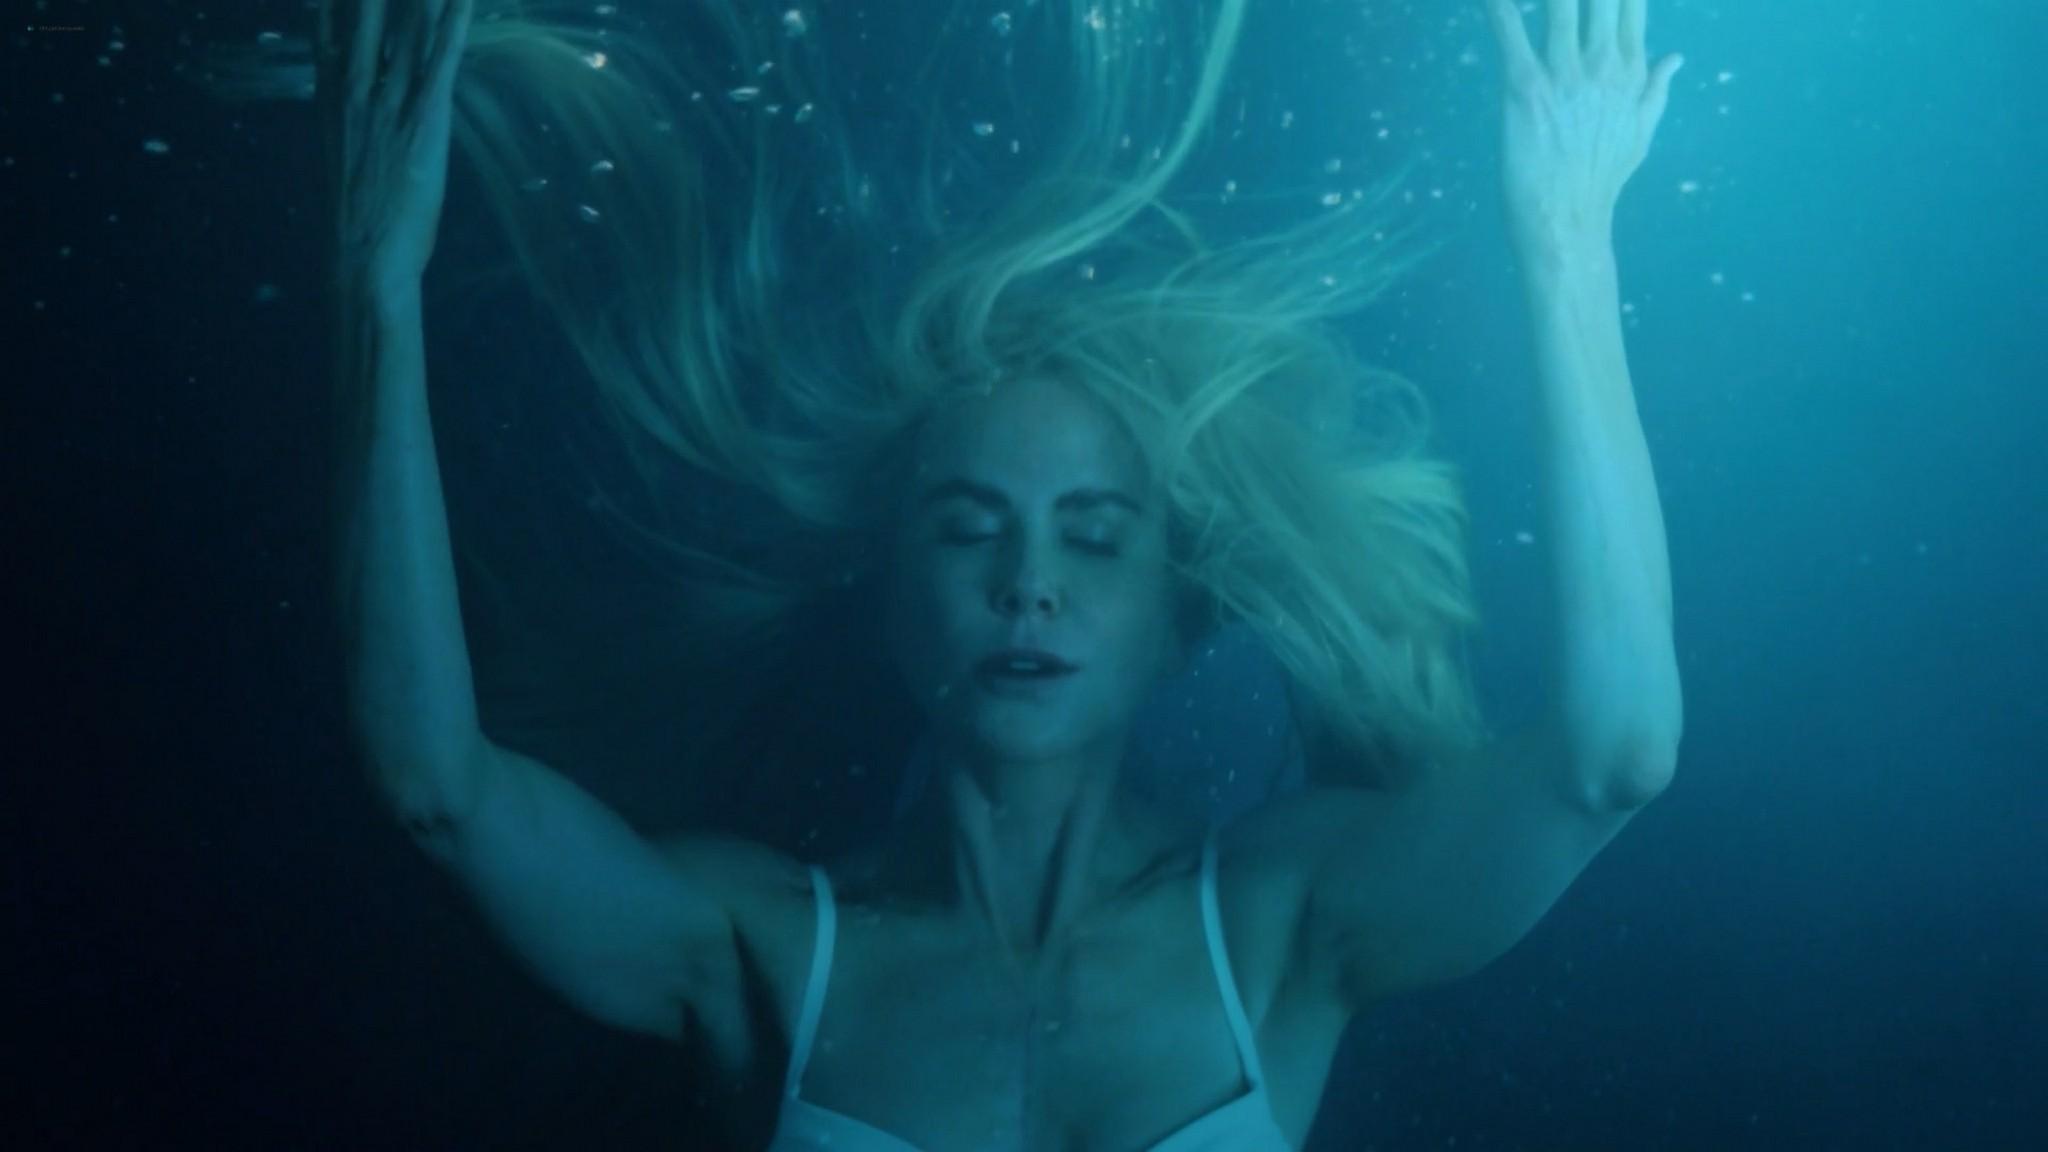 Samara Weaving hot sex Nicole Kidman and others sexy Nine Perfect Strangers 2021 s1e5 1080p 2